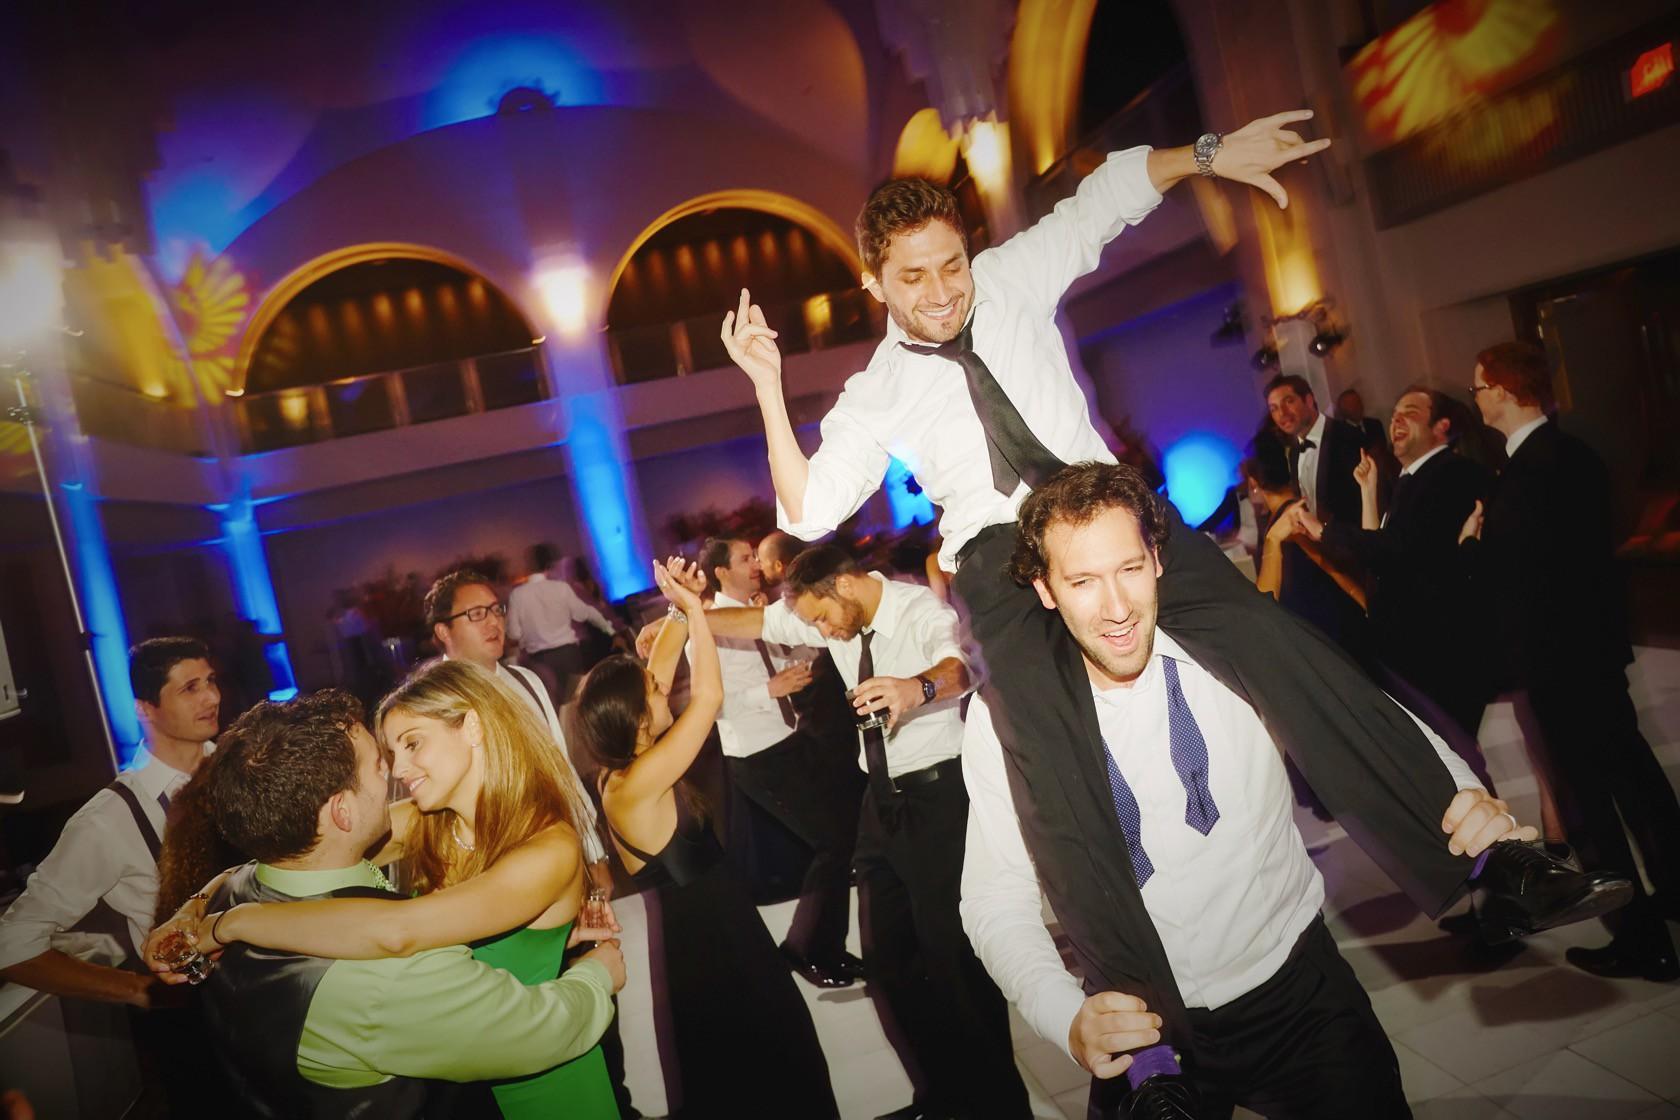 stephen sager photography 0073 fine art wedding photography